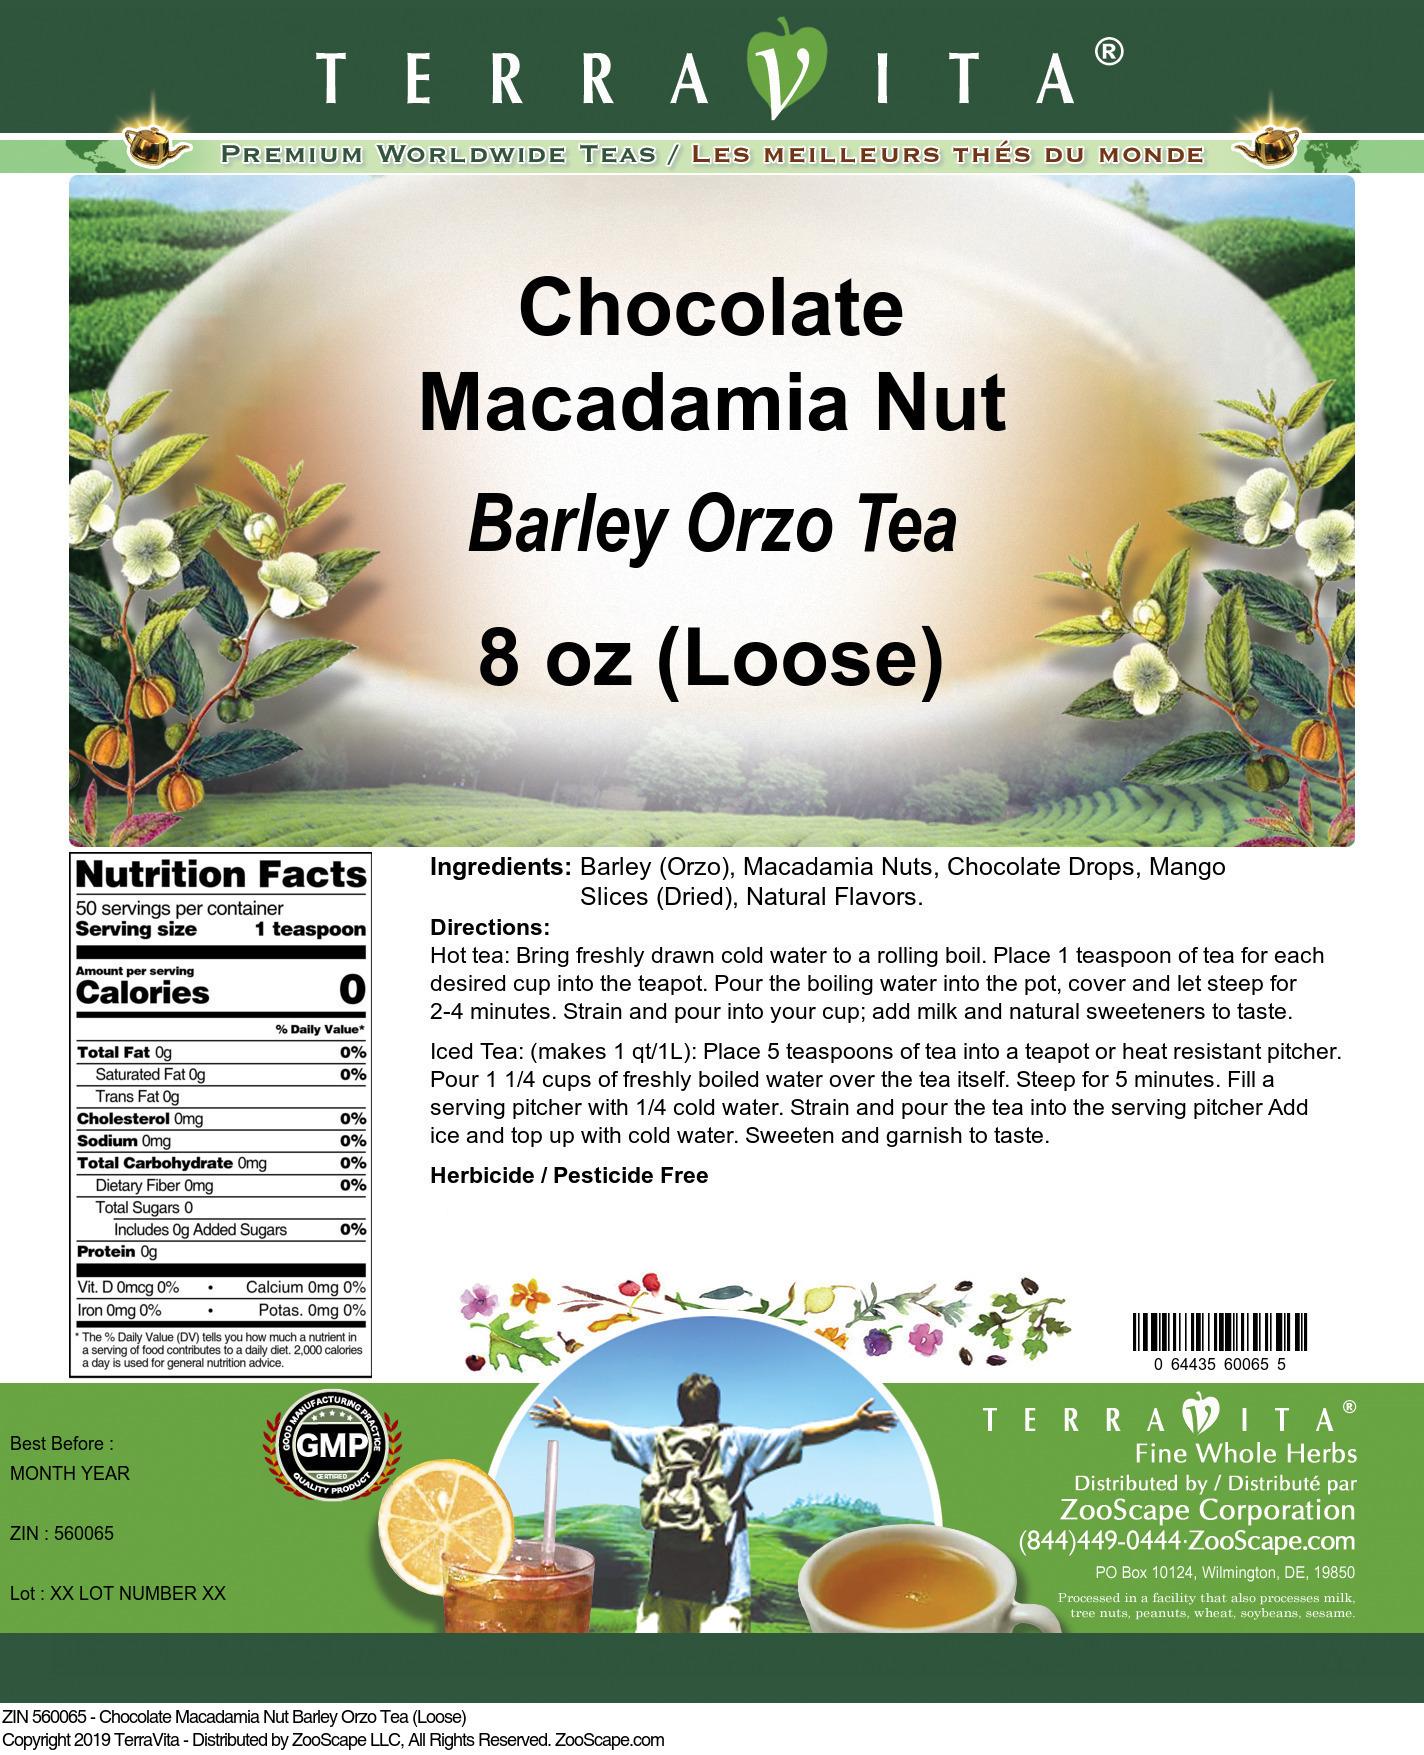 Chocolate Macadamia Nut Barley Orzo Tea (Loose)